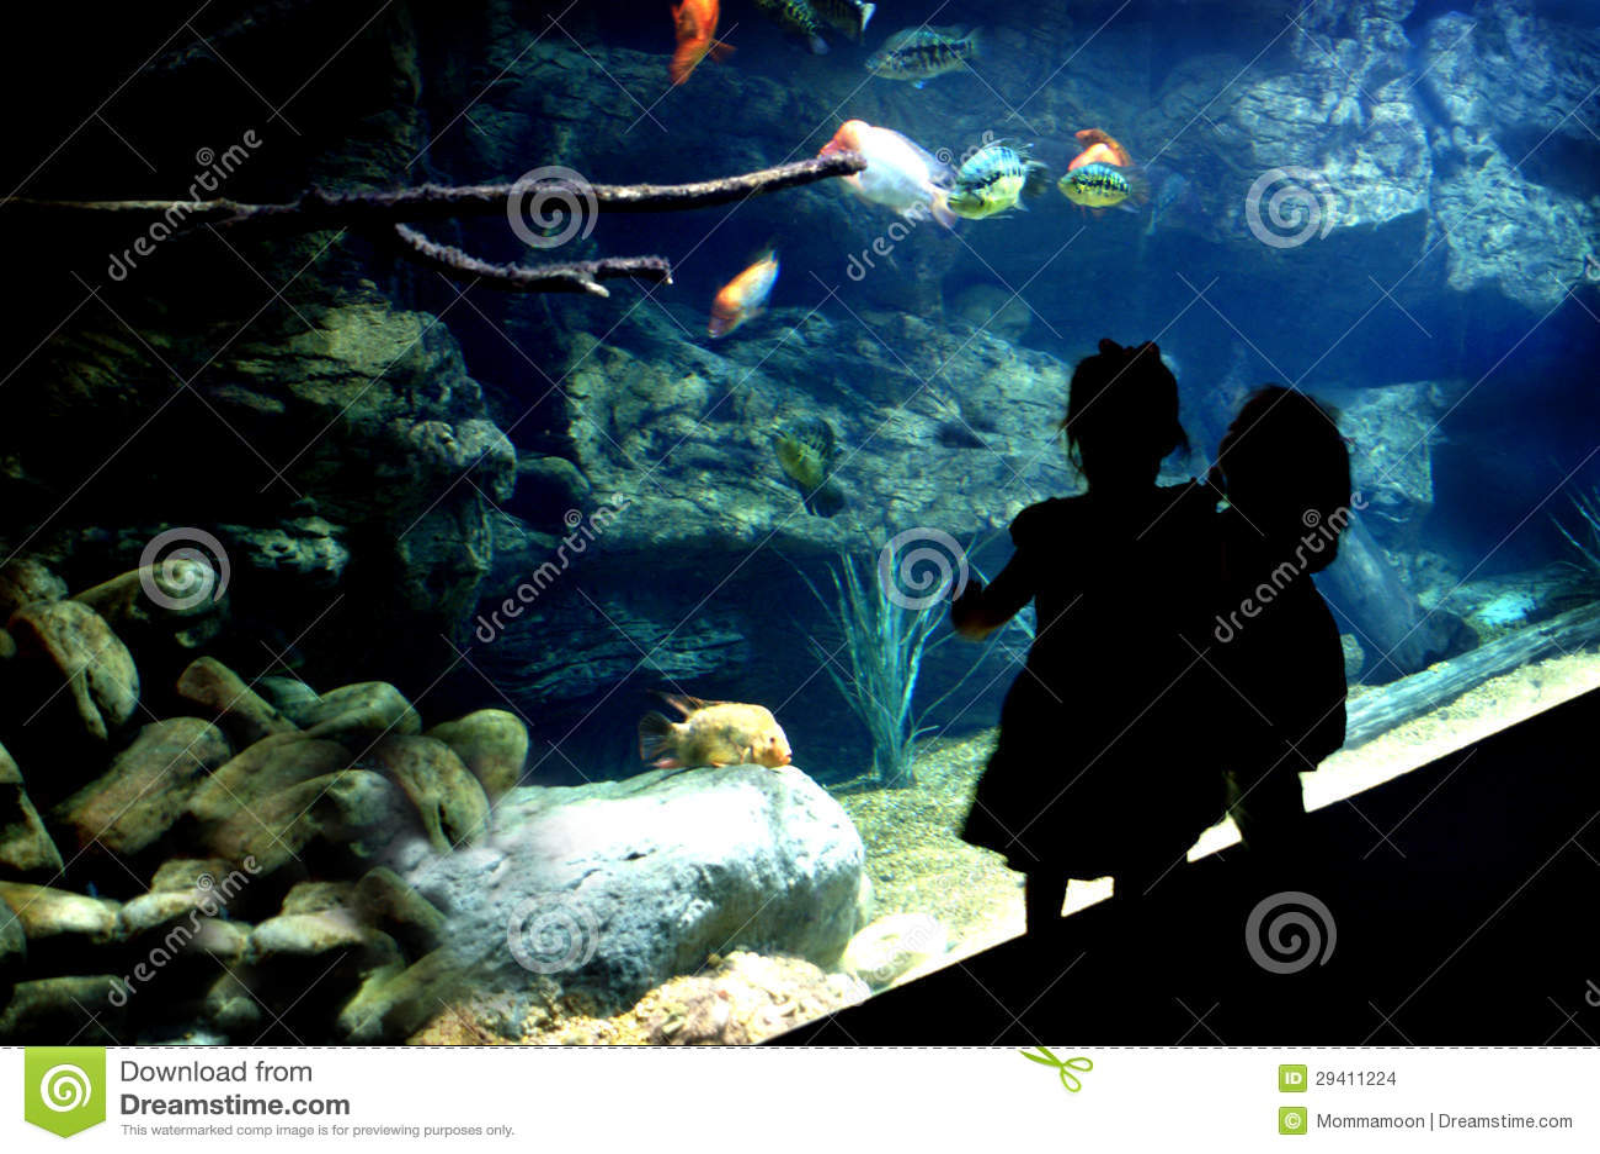 Silhouette Two Little Girls At Public Aquarium Stock